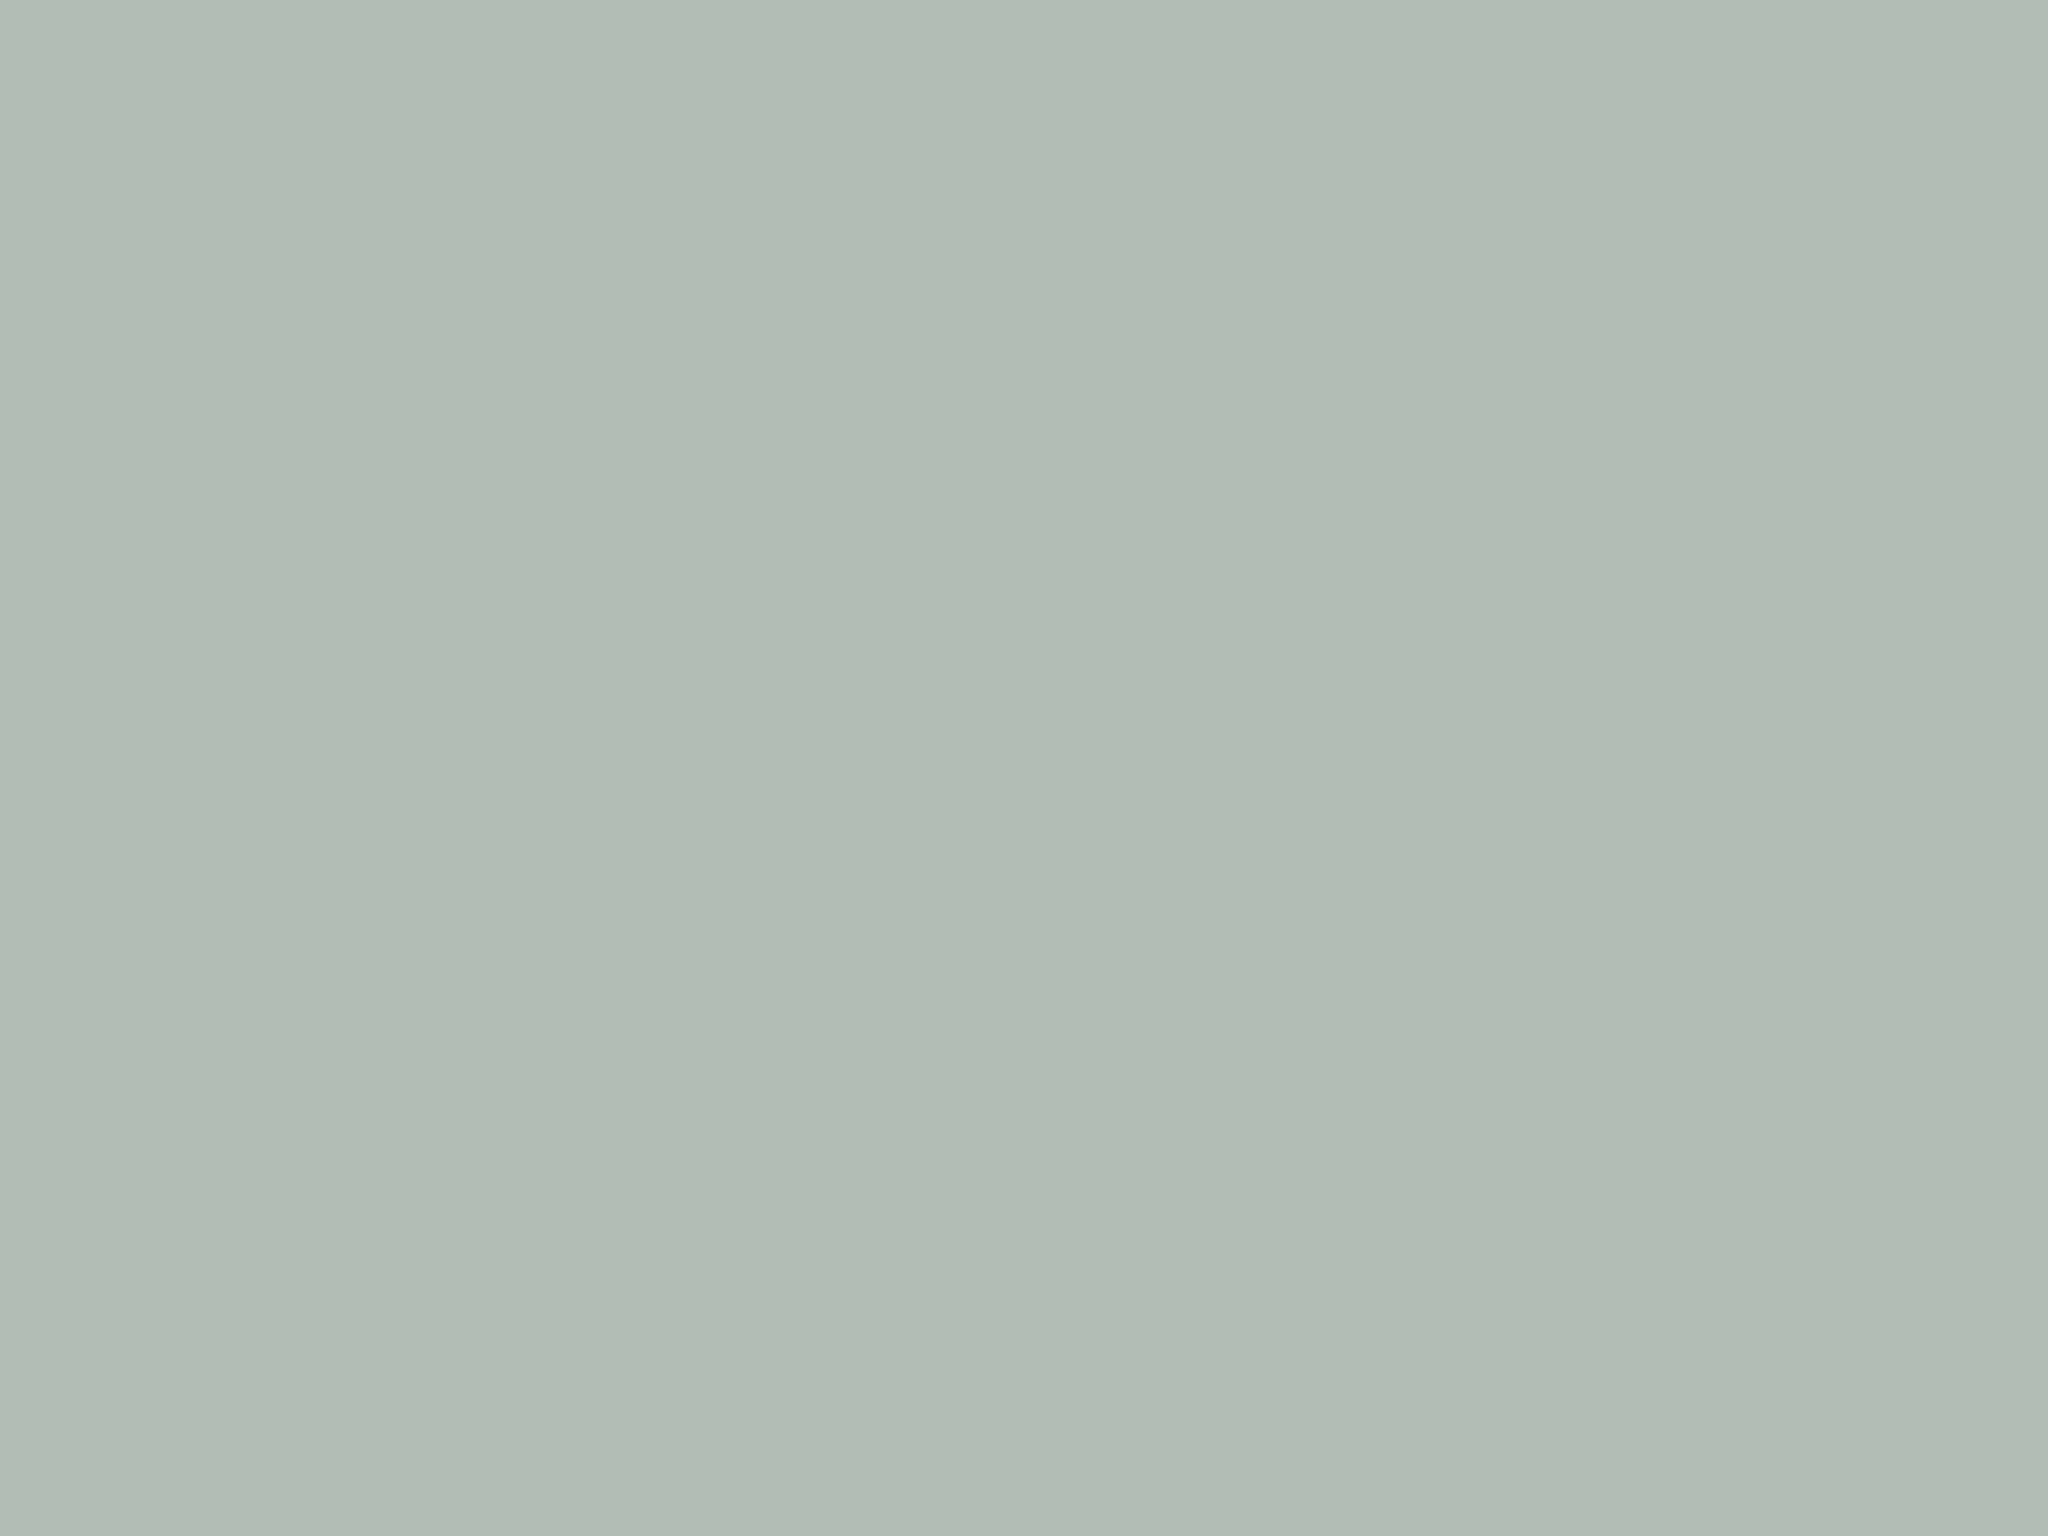 2048x1536 Ash Grey Solid Color Background